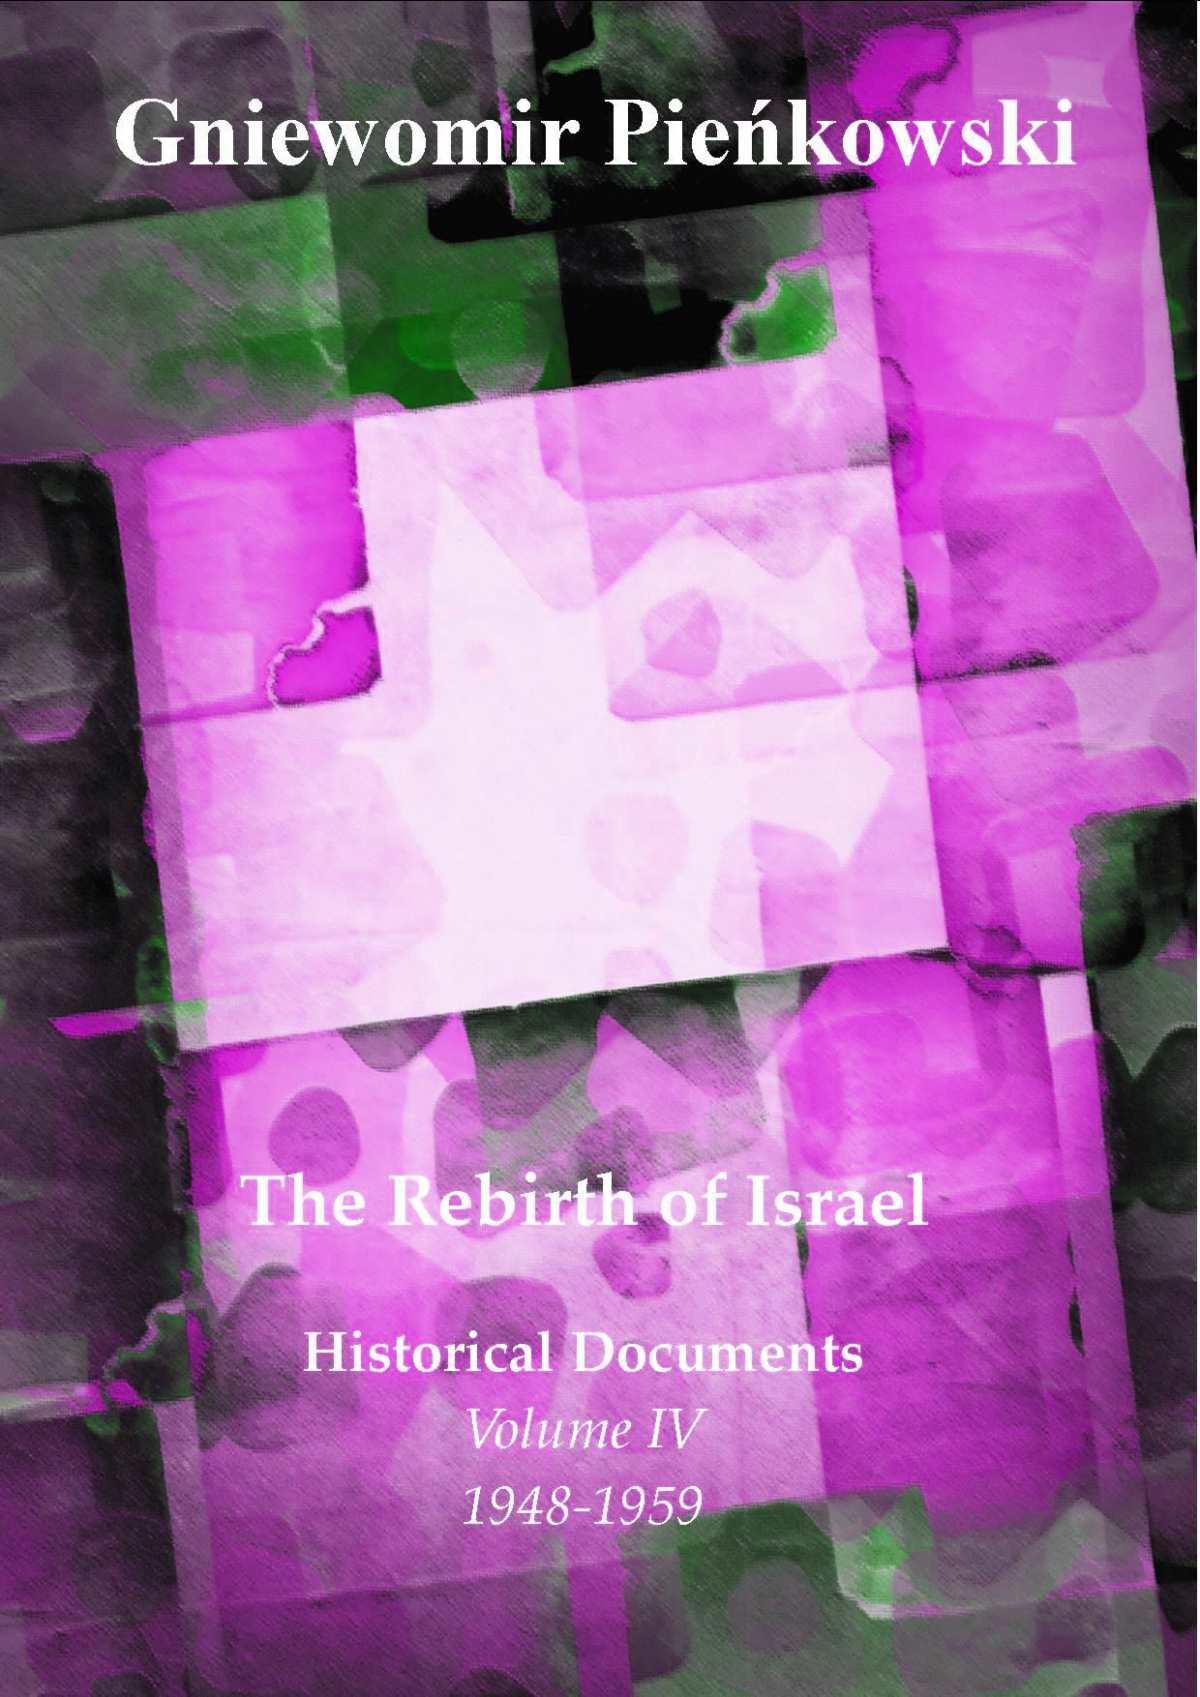 The Rebirth of Israel. Historical Documents. Volume IV: 1948-1959 - Ebook (Książka PDF) do pobrania w formacie PDF